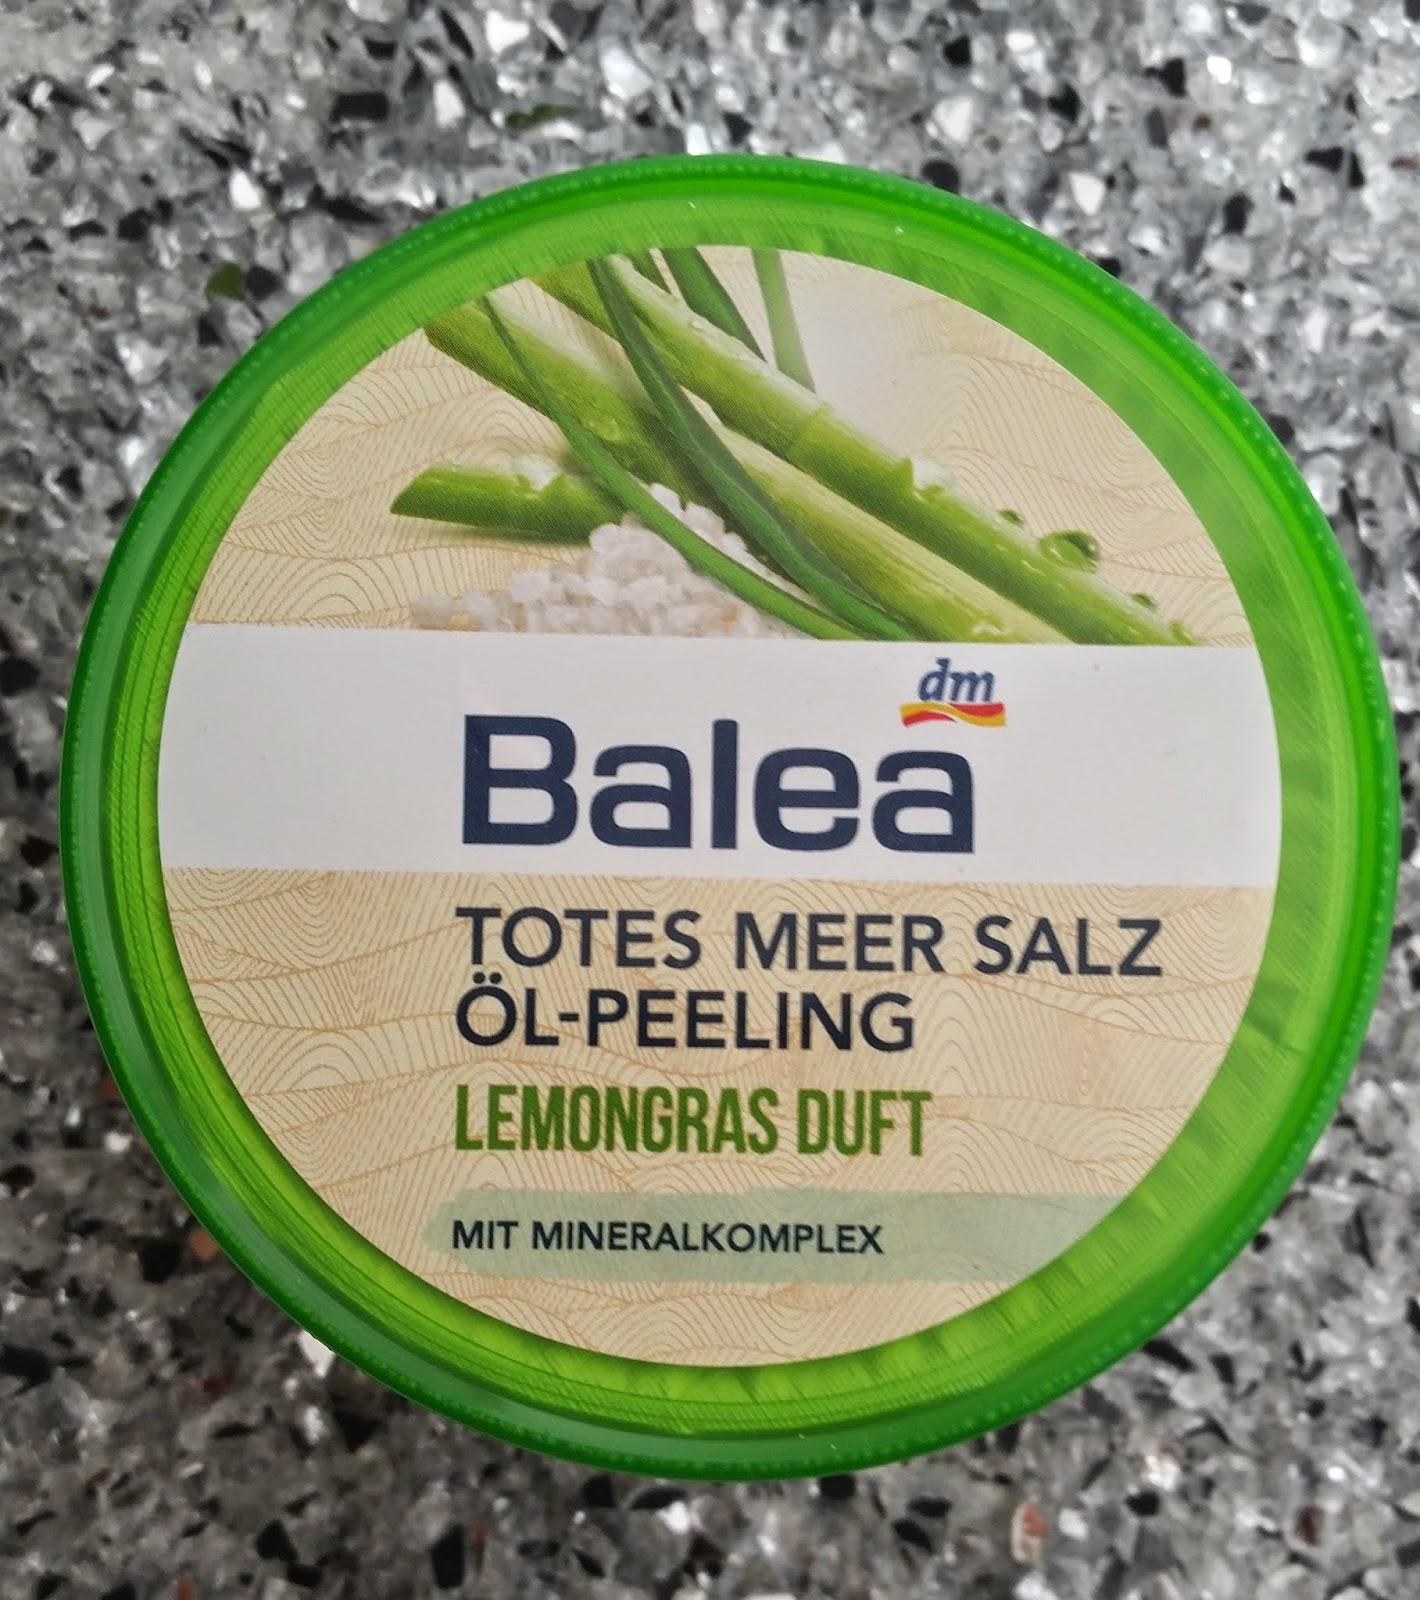 Balea Totes Meer Salz Öl Peeling - www.annitschkasblog.de